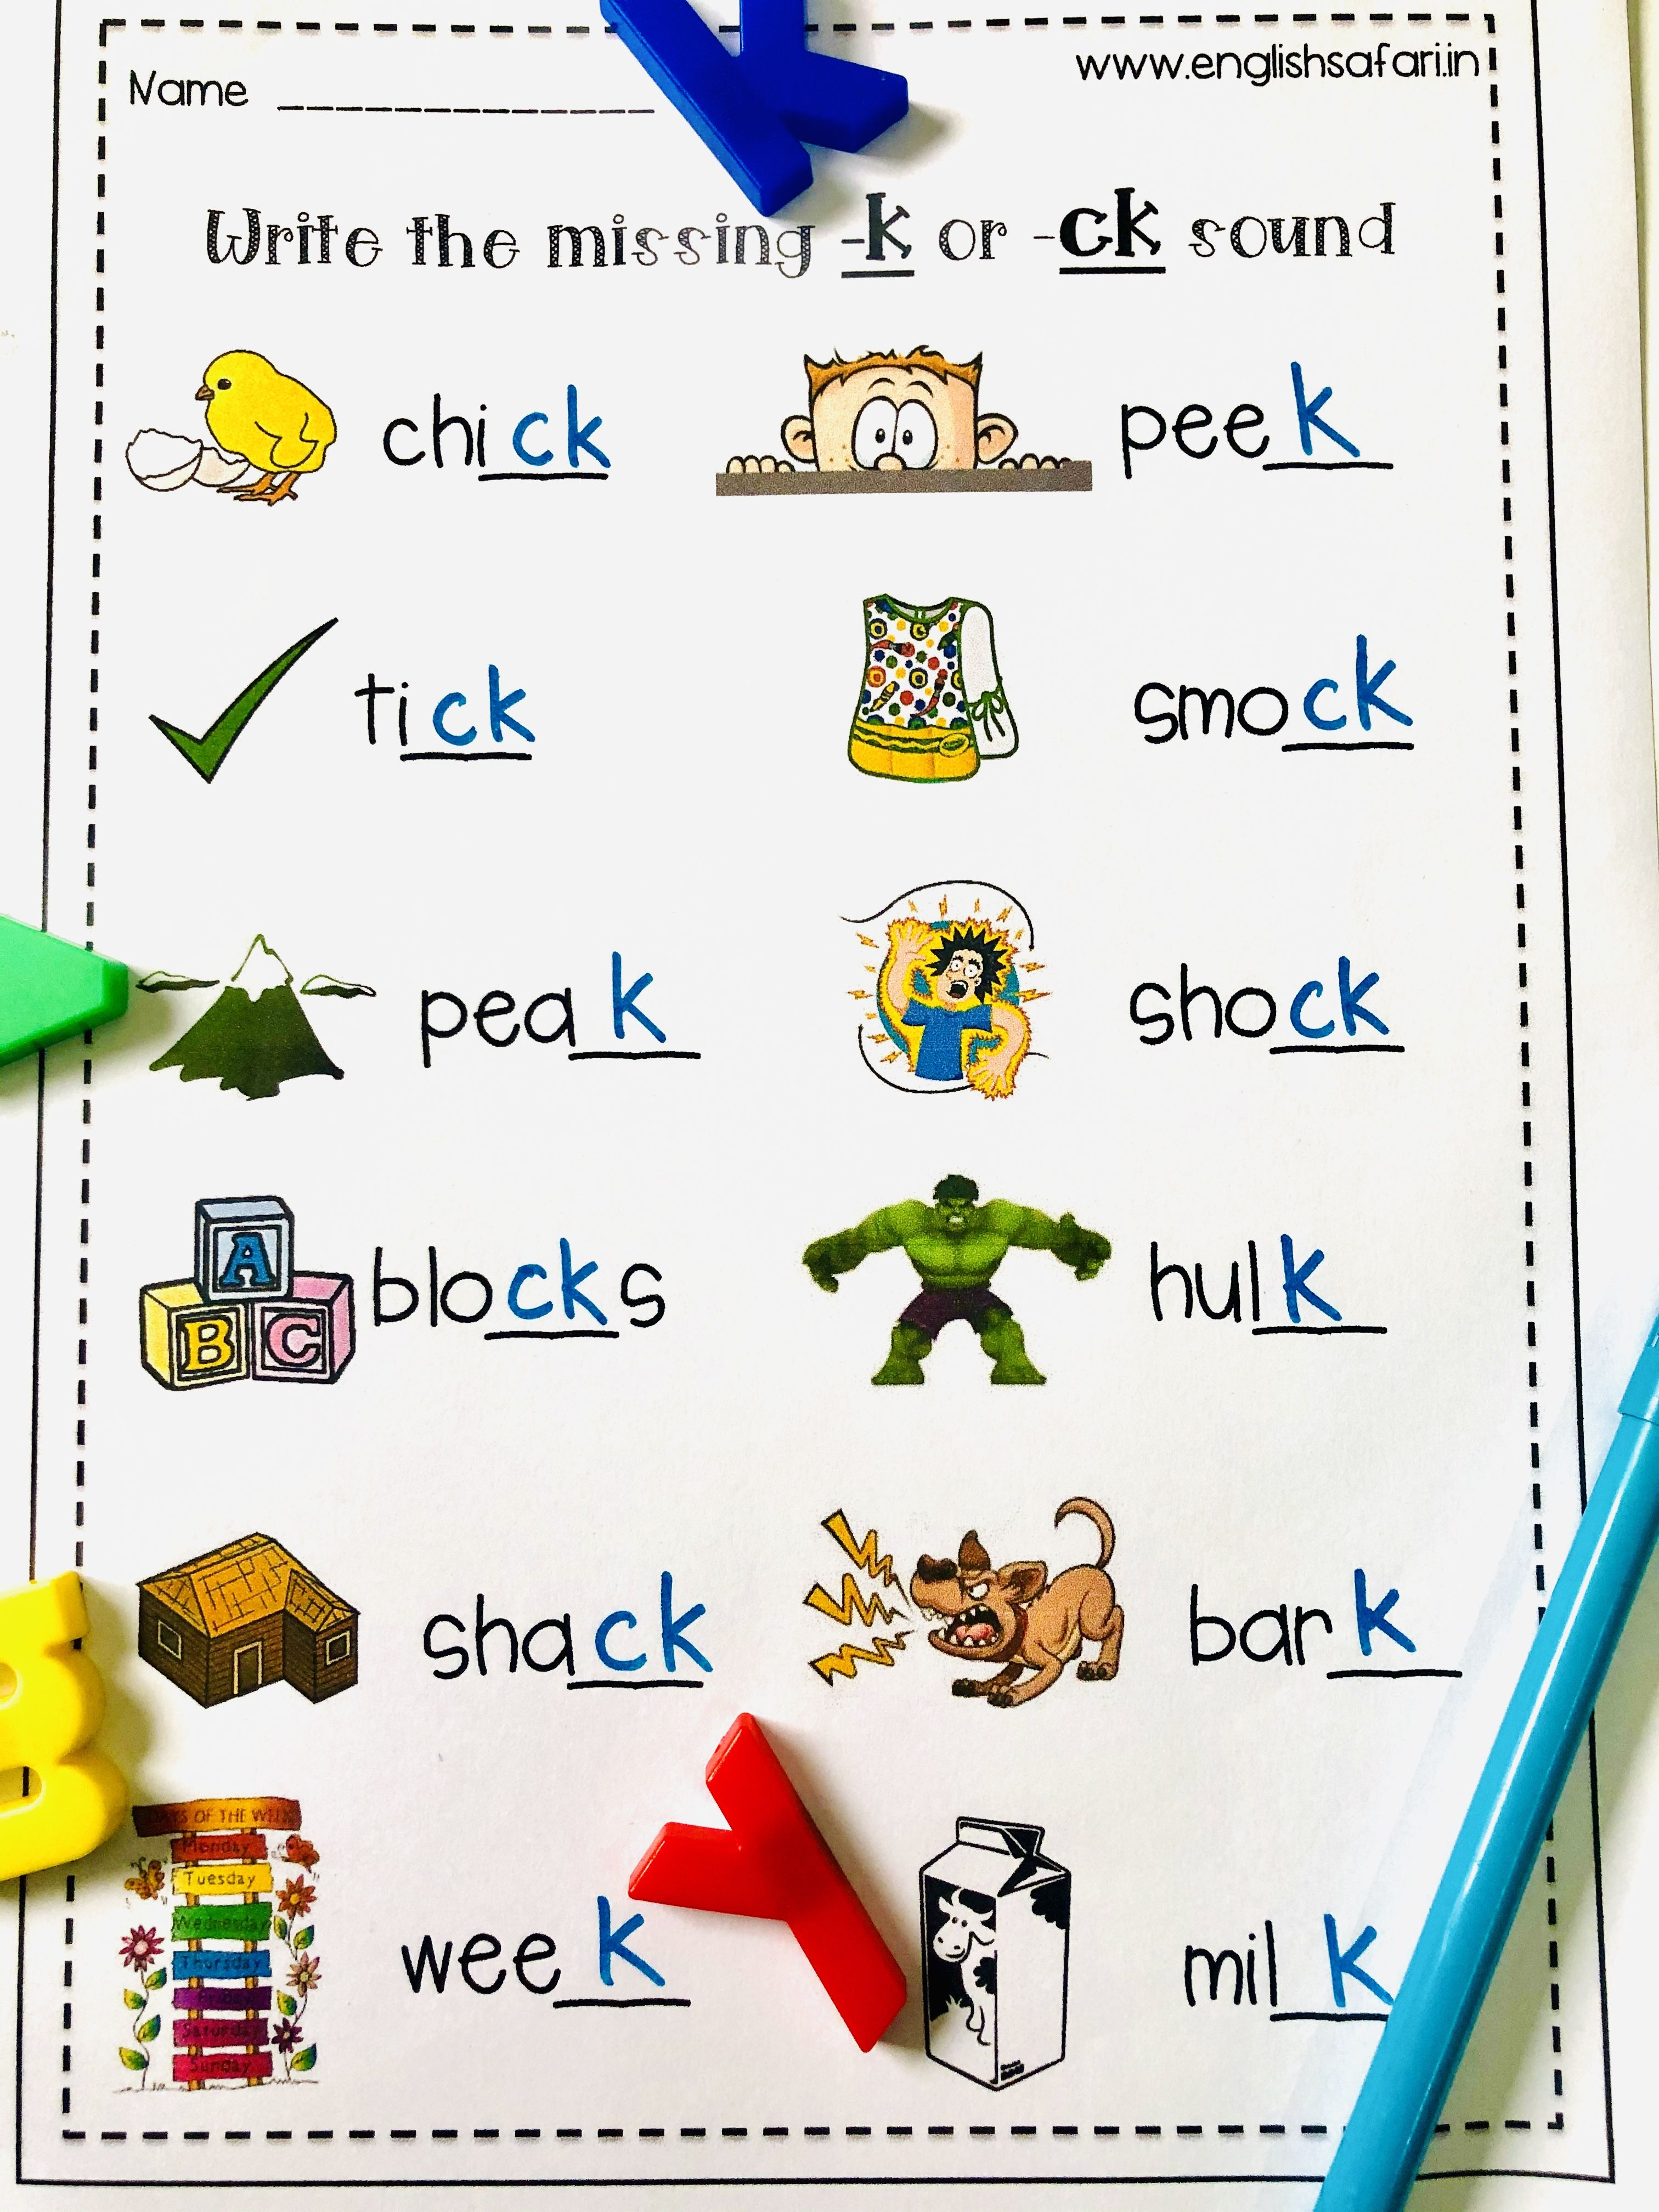 Free Ck Or K Words Worksheet Spelling Rules Activities Spelling Rules English Phonics [ 4032 x 3024 Pixel ]